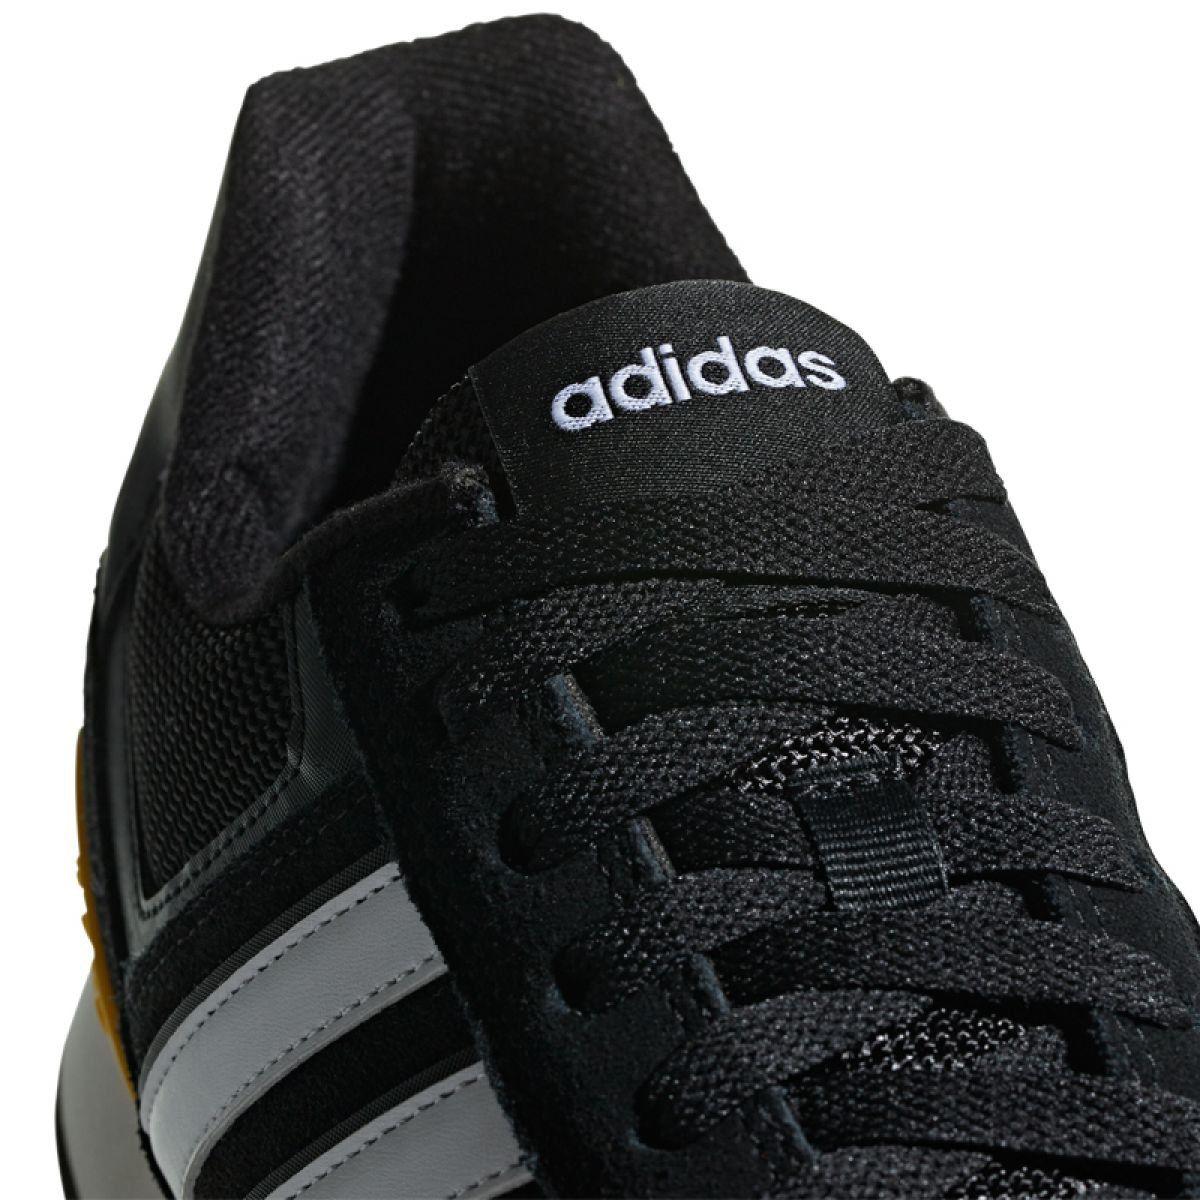 Buty Adidas 10k M F34457 Czarne Sports Shoes Adidas Black Shoes Suede Design